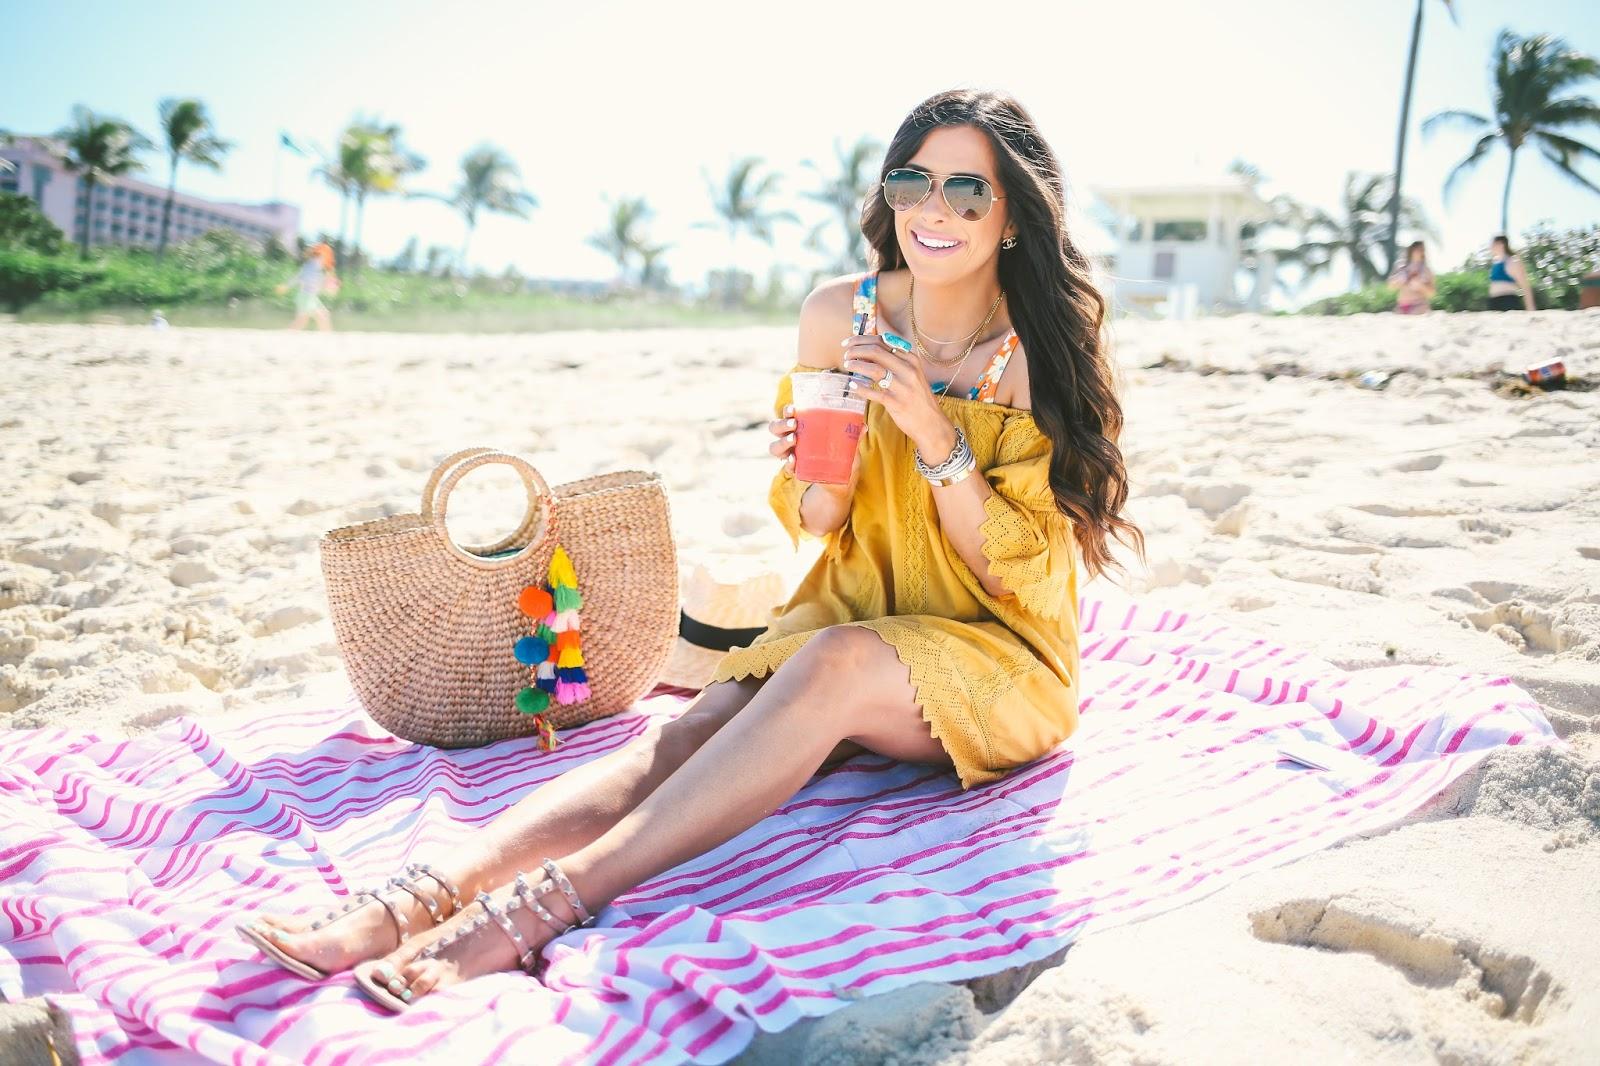 las bahadas beach towel, motel swimwear, revolve swimwear, bahamas atlantis review, emily gemma bahamas